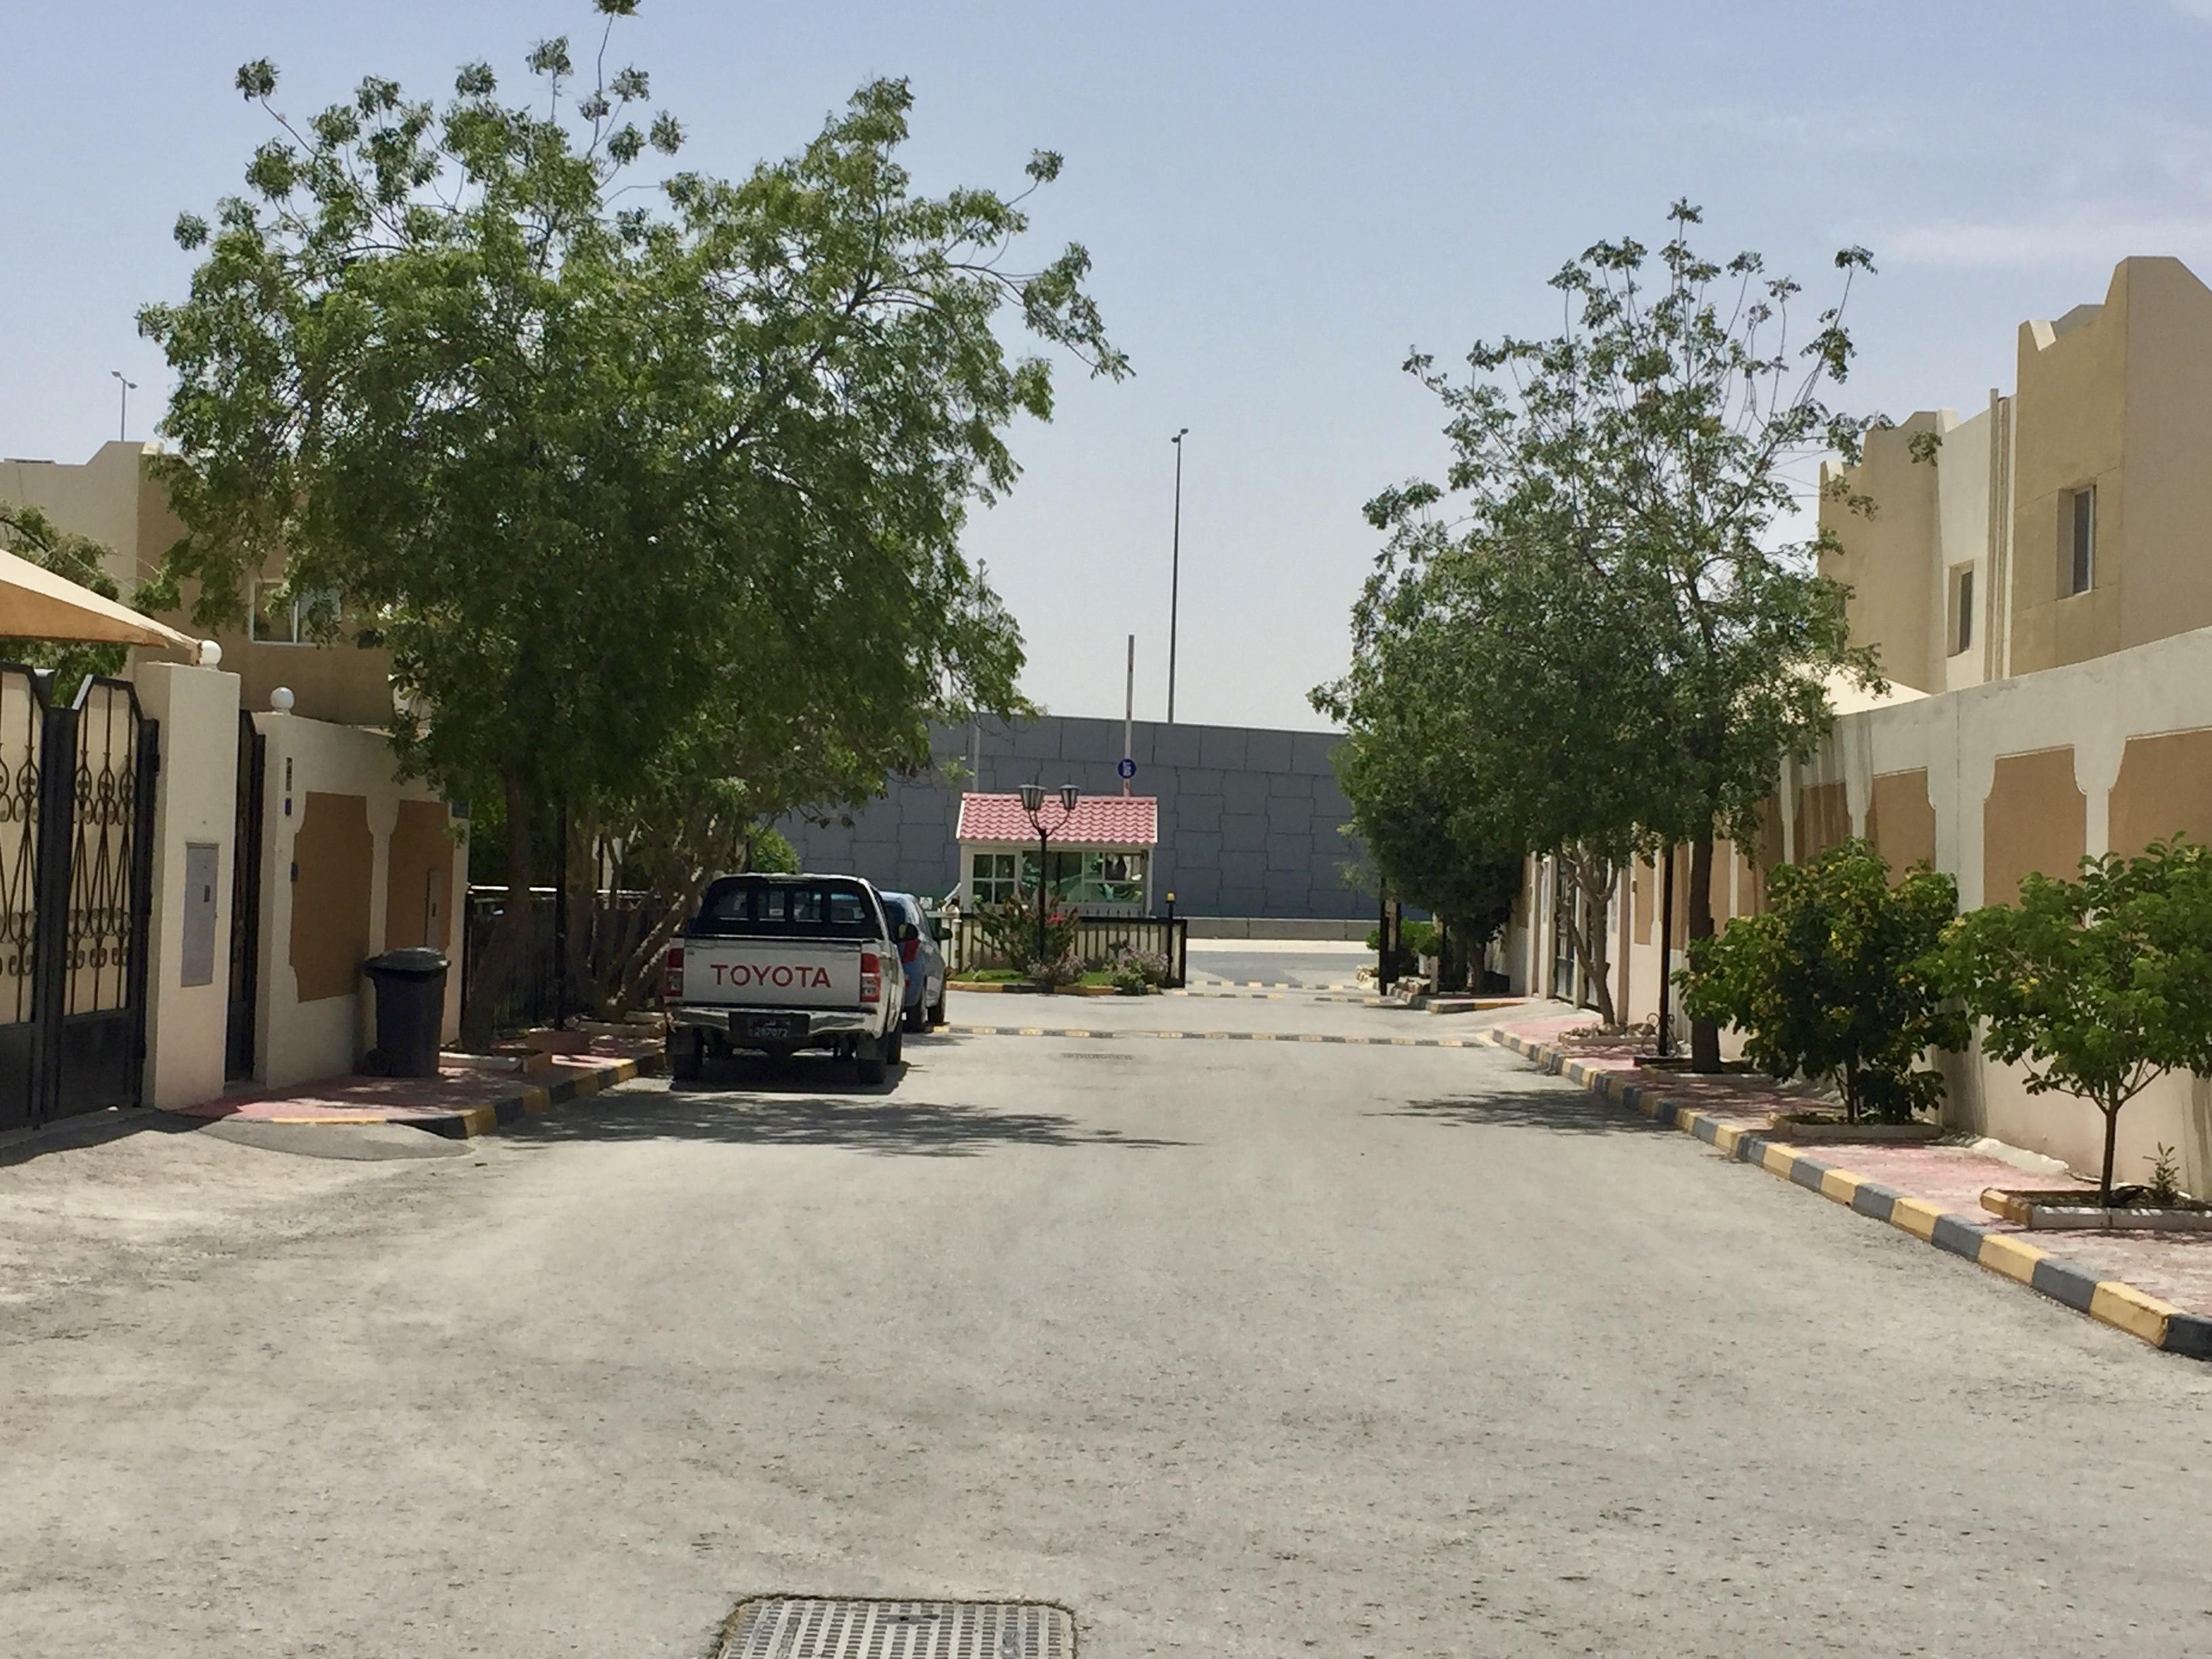 April, 2019 - Doha, Qatar - Al Jazeera Compound I - Main Entrance